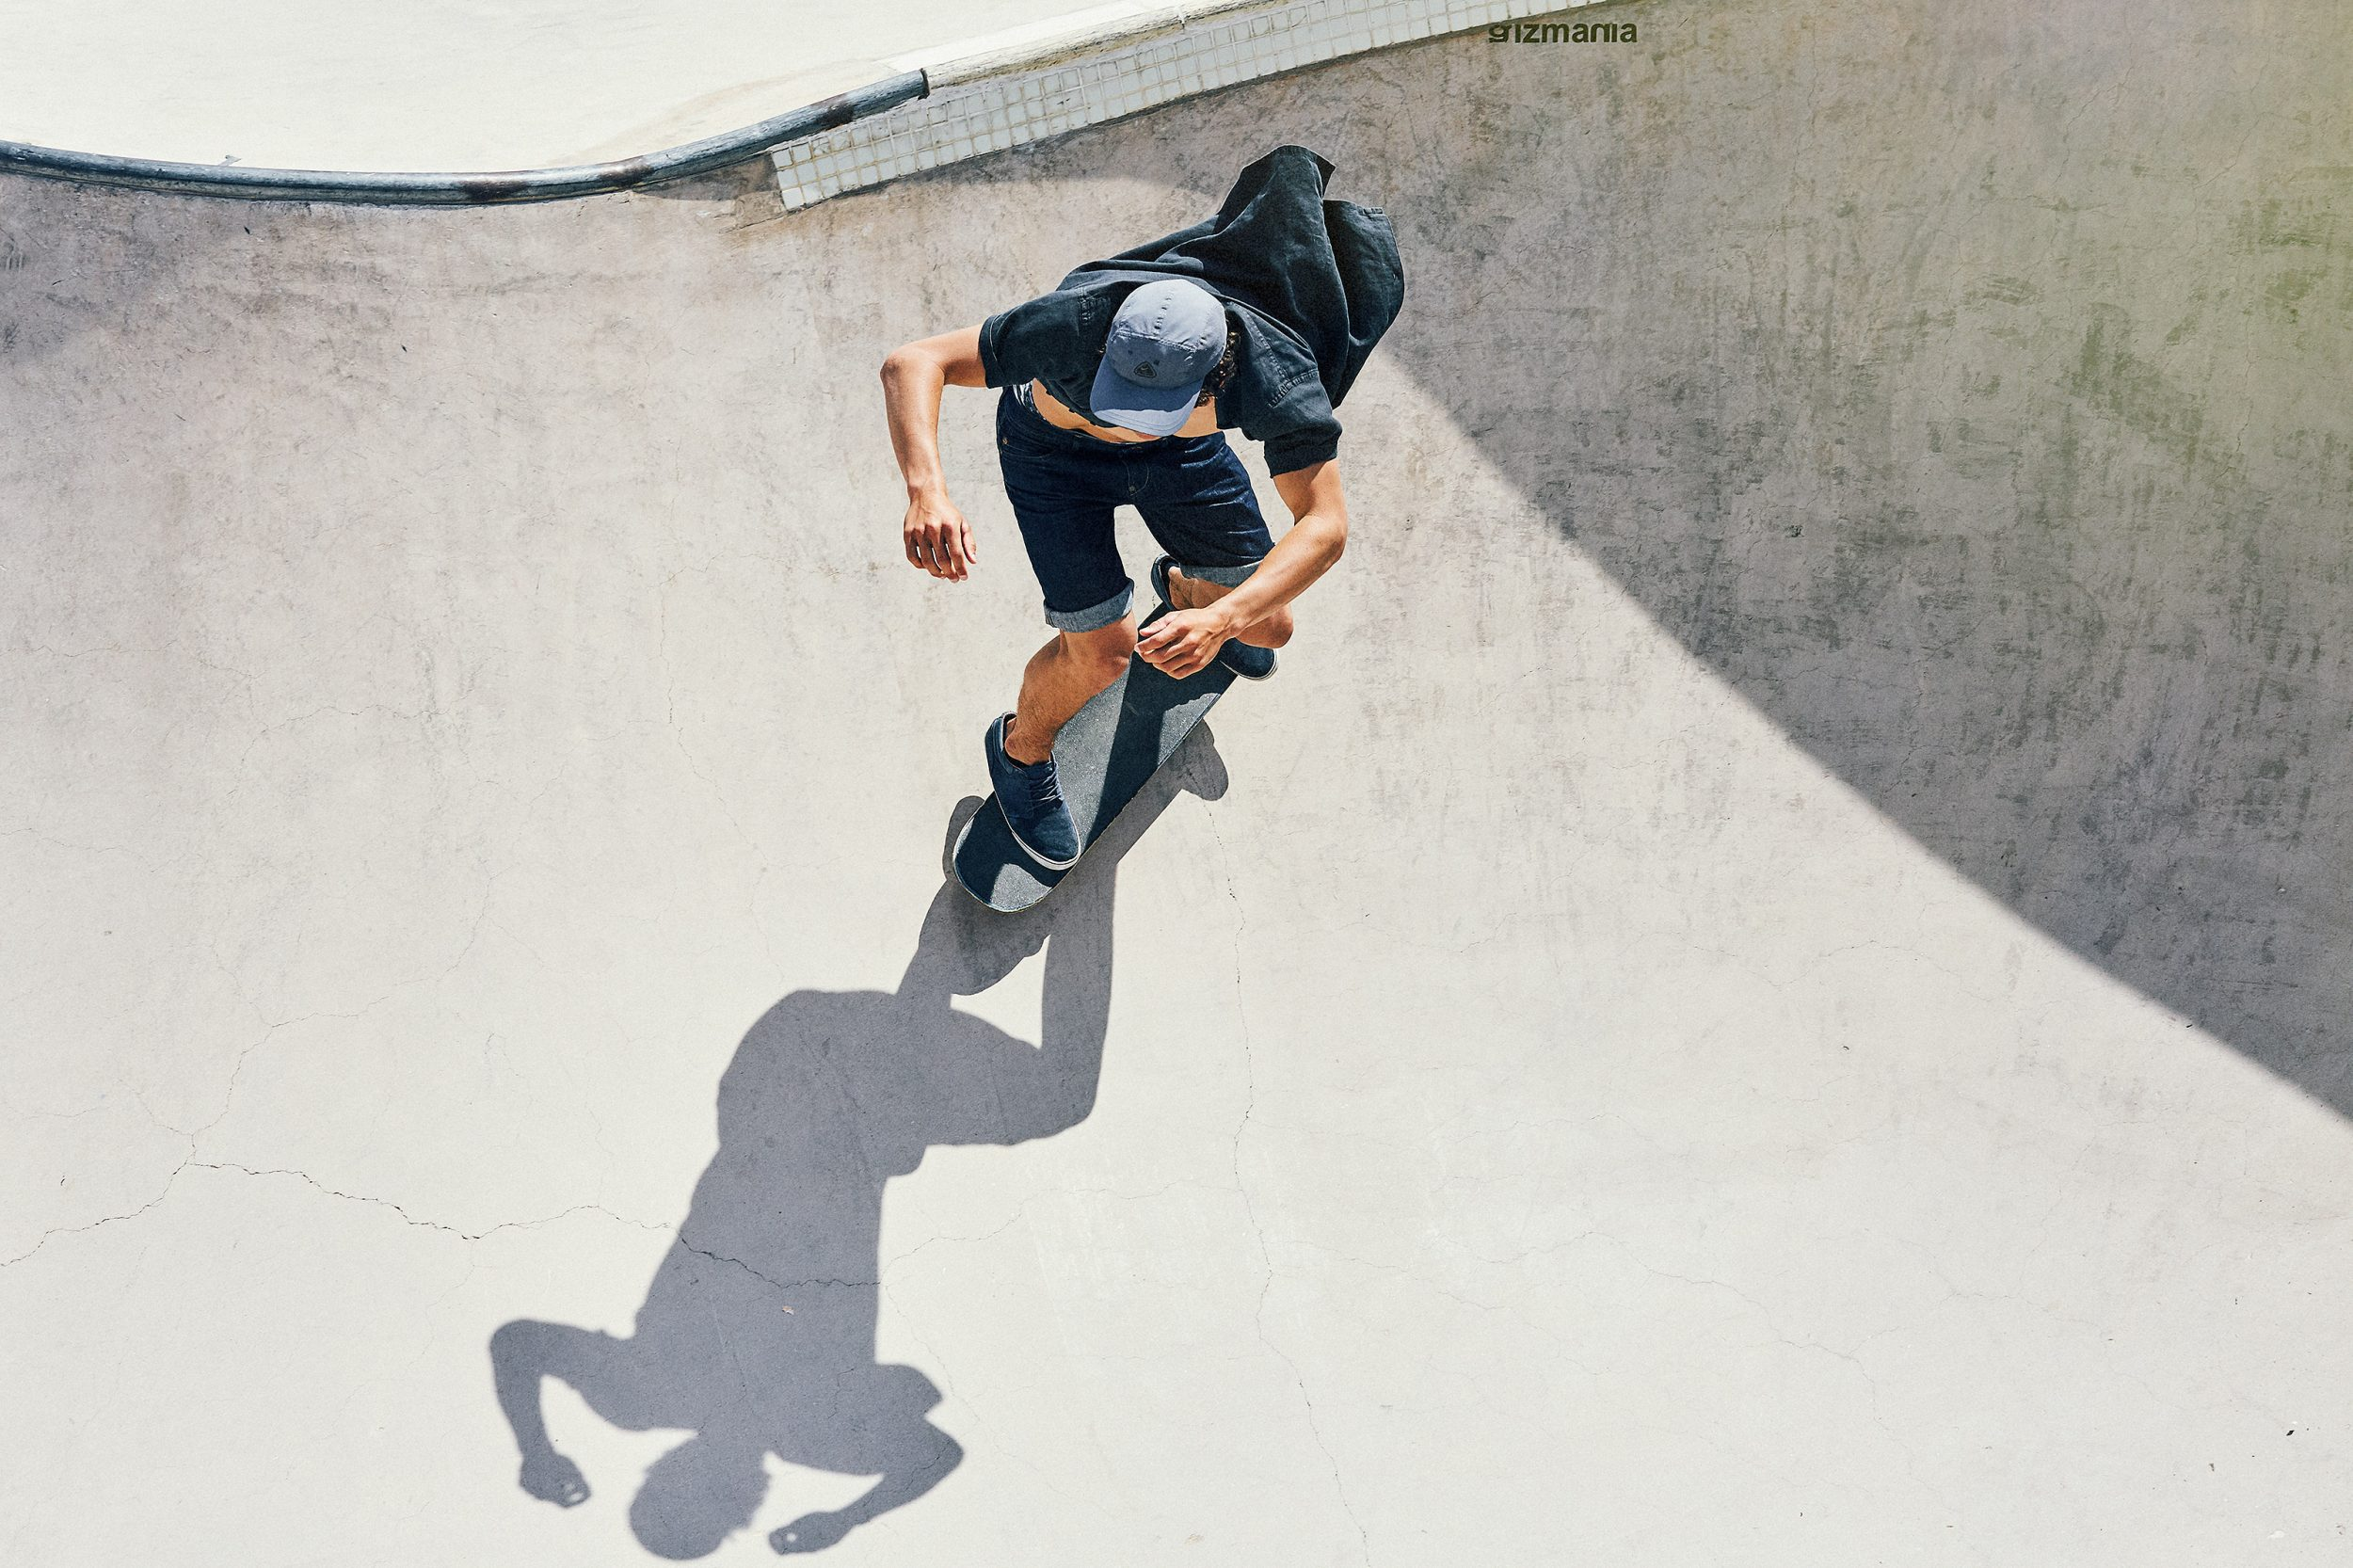 Skateboarding Barcelona